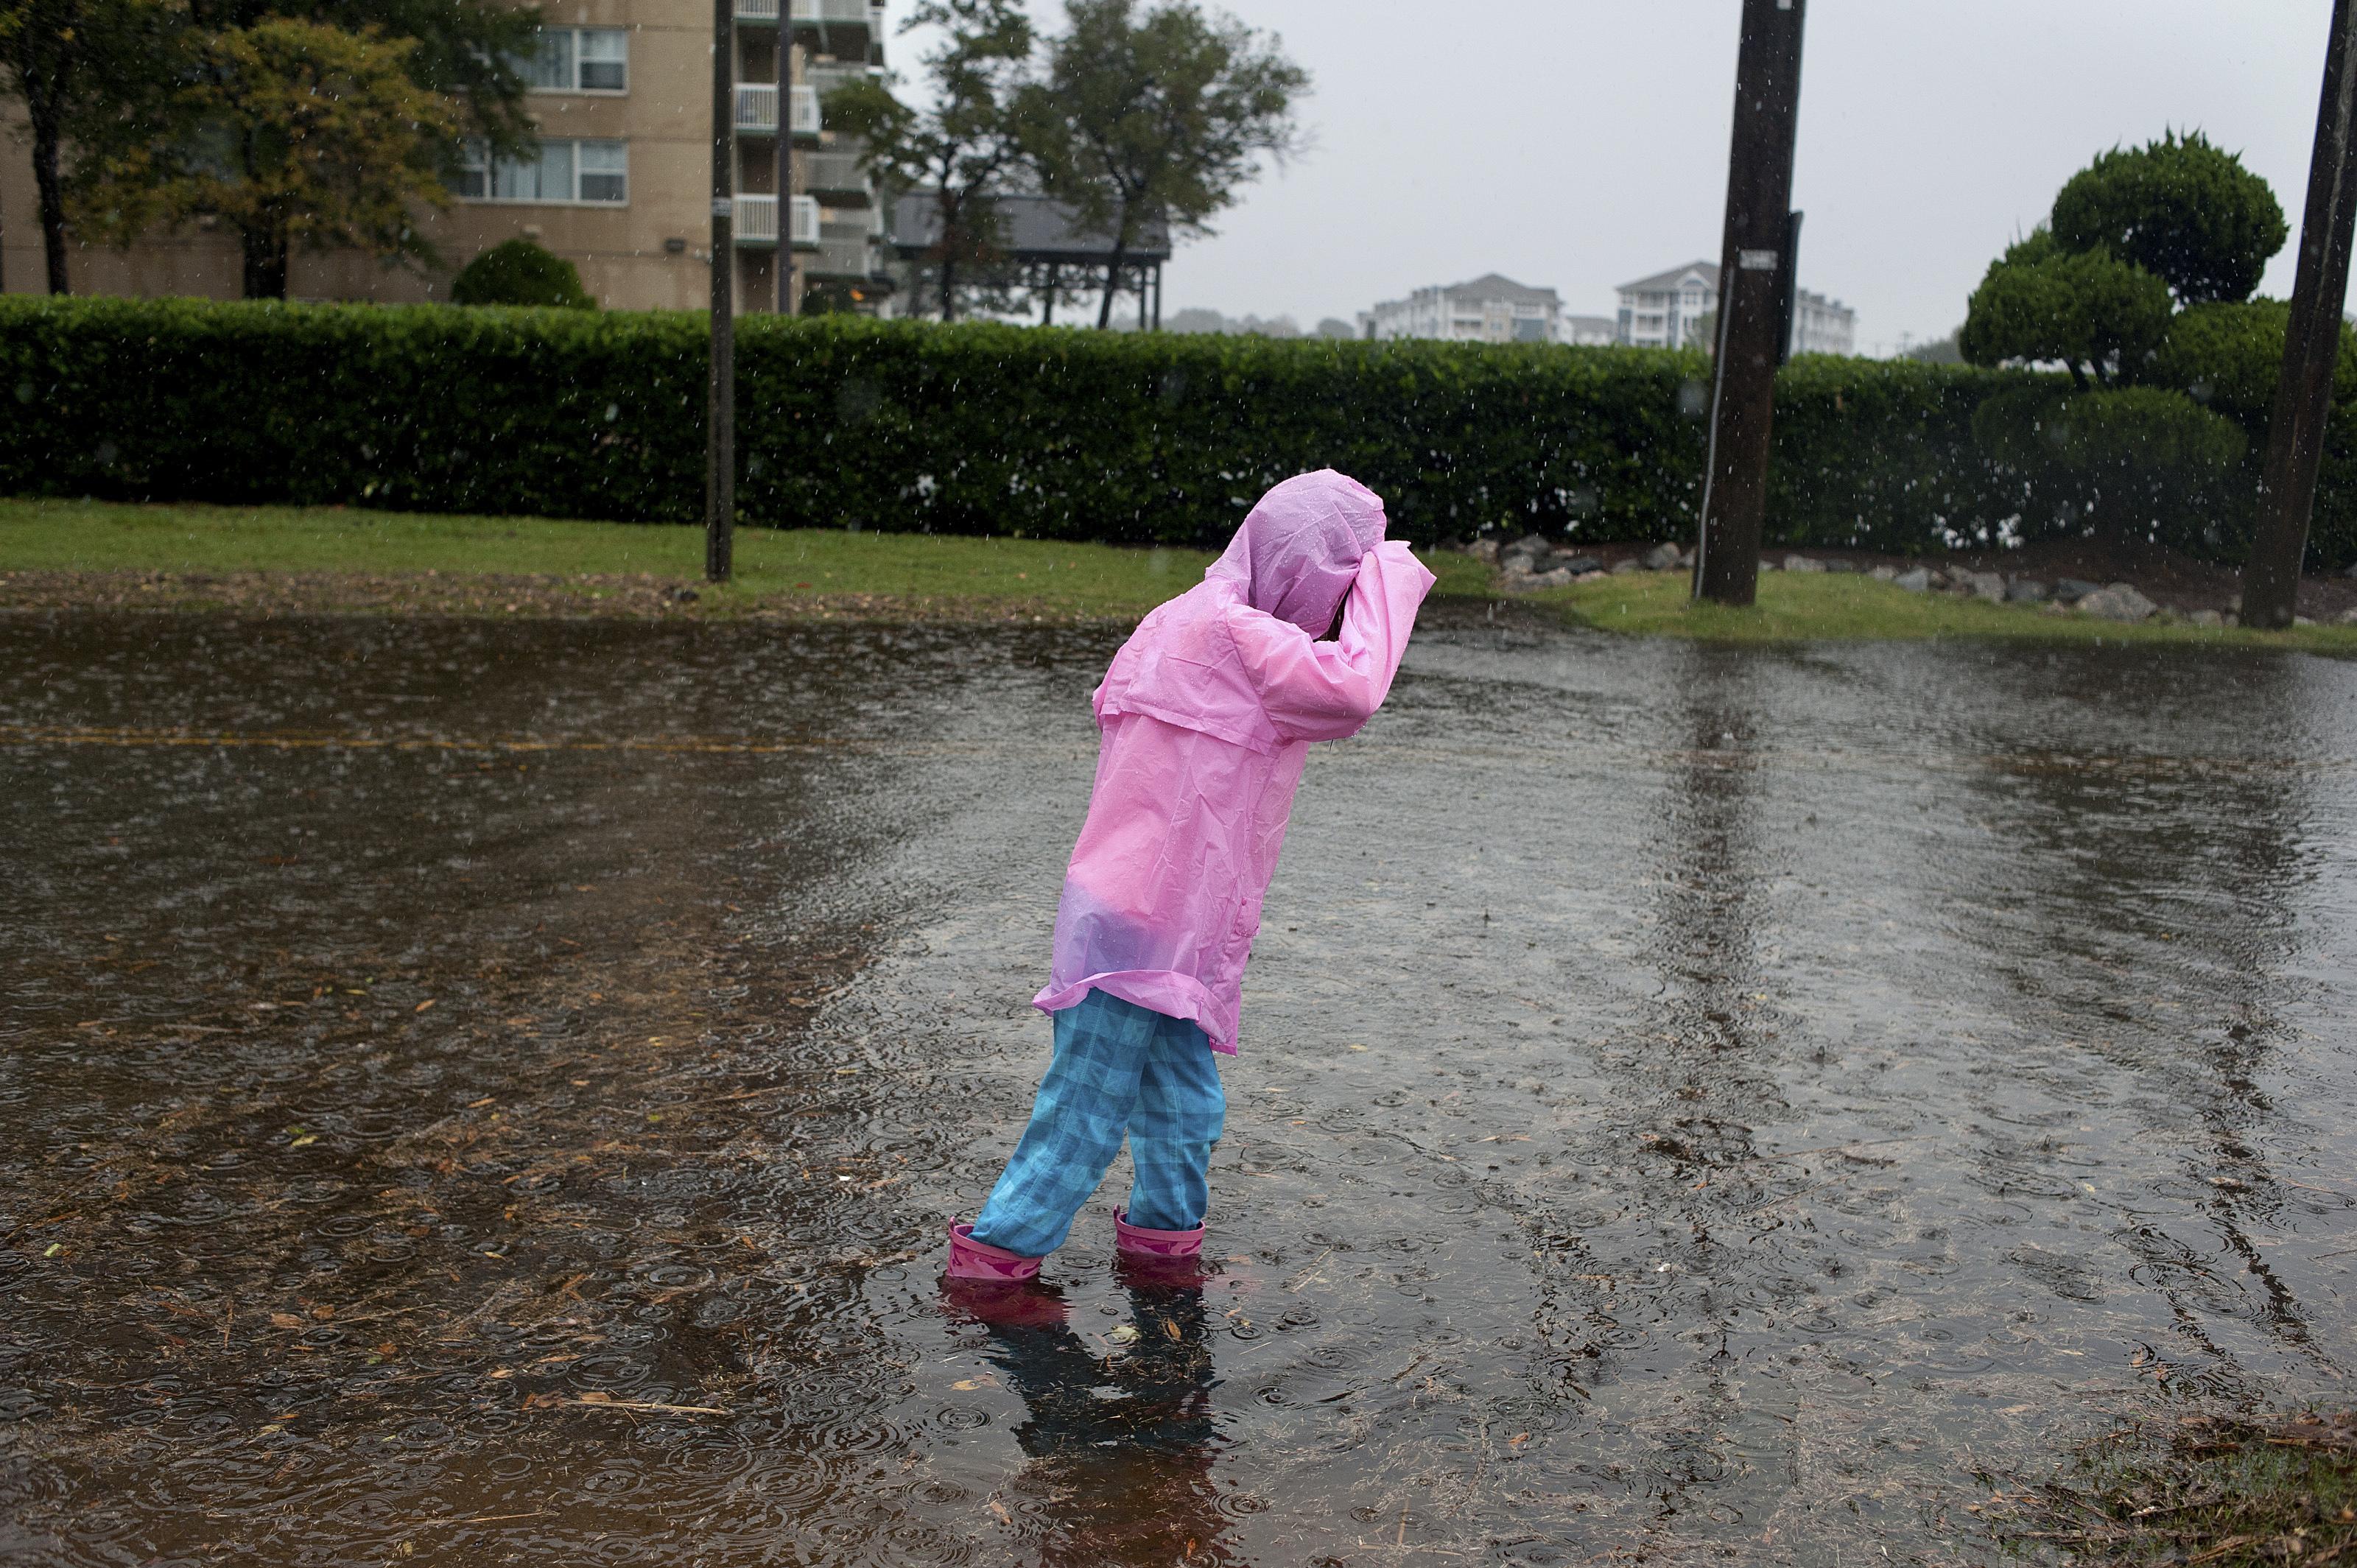 Girl walking through flooded street